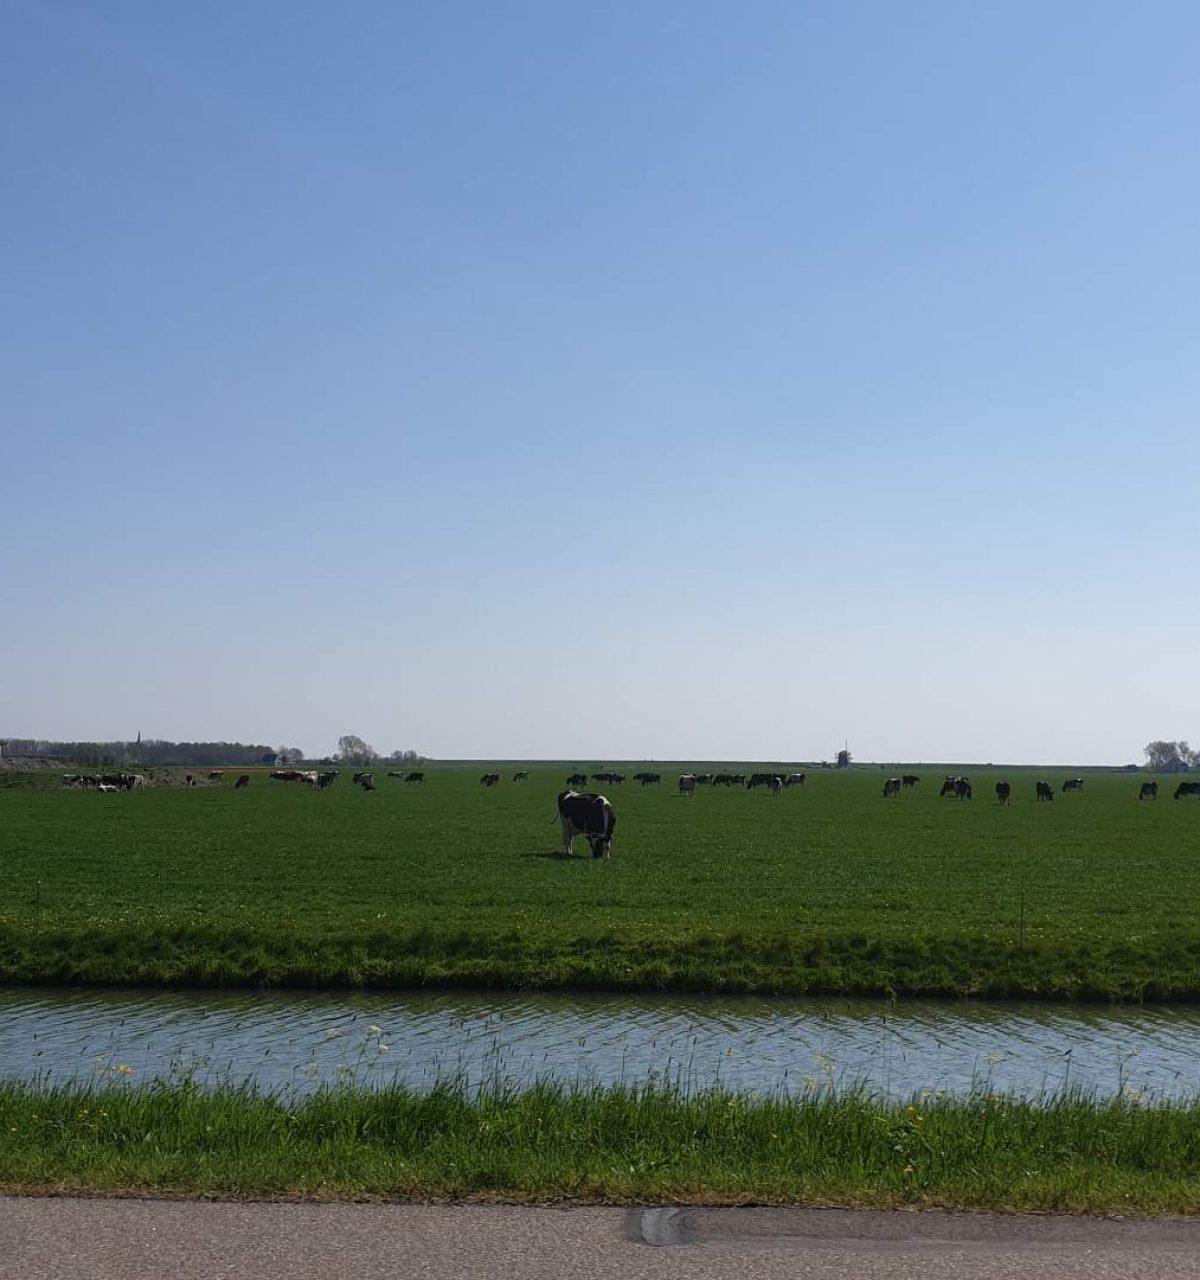 holland boven amsterdam natuur noord holland westwoud-g27